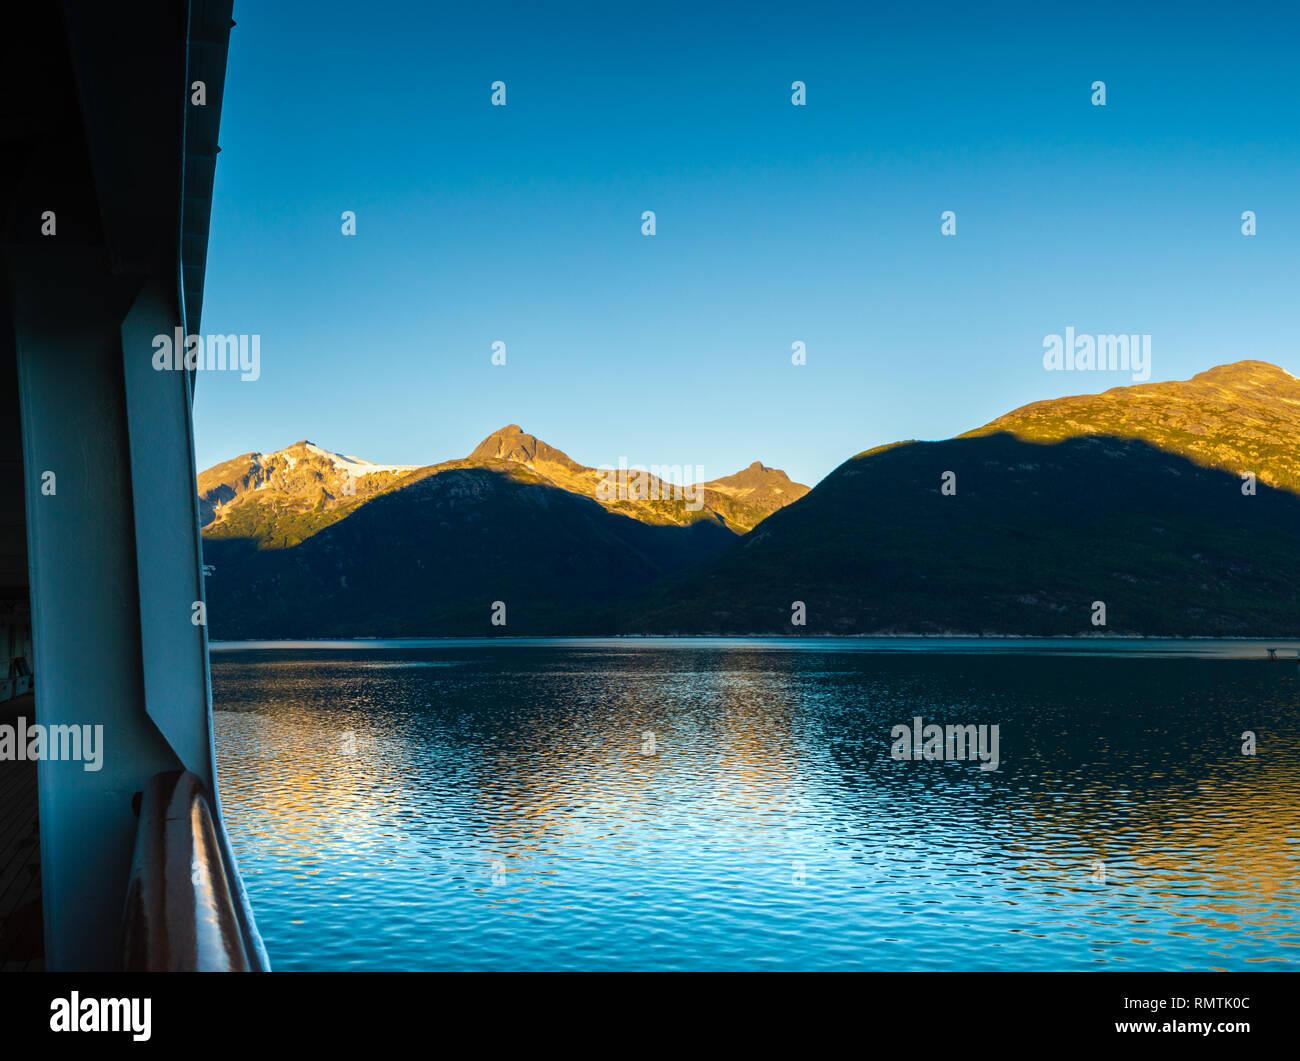 Early morning sunrise light on mountains, from outdoor promenade deck of cruise ship, Taiya Inlet, Skagway, Alaska, USA. - Stock Image